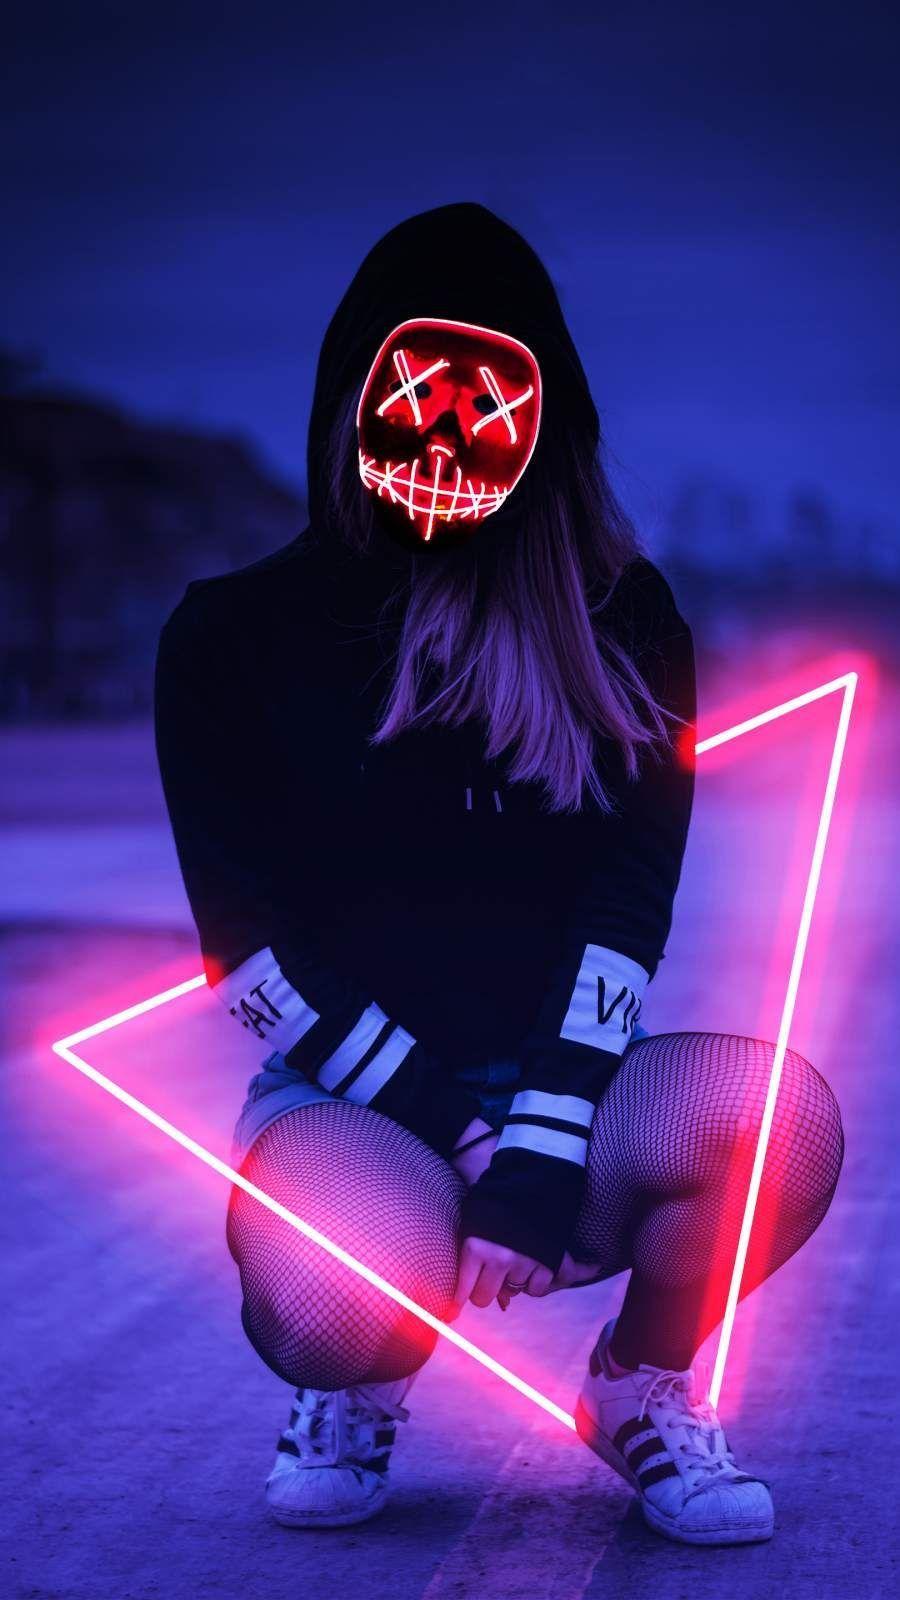 Neon Girl Iphone Wallpaper 1 4k In 2020 Girl Iphone Wallpaper Neon Girl Cyberpunk Girl